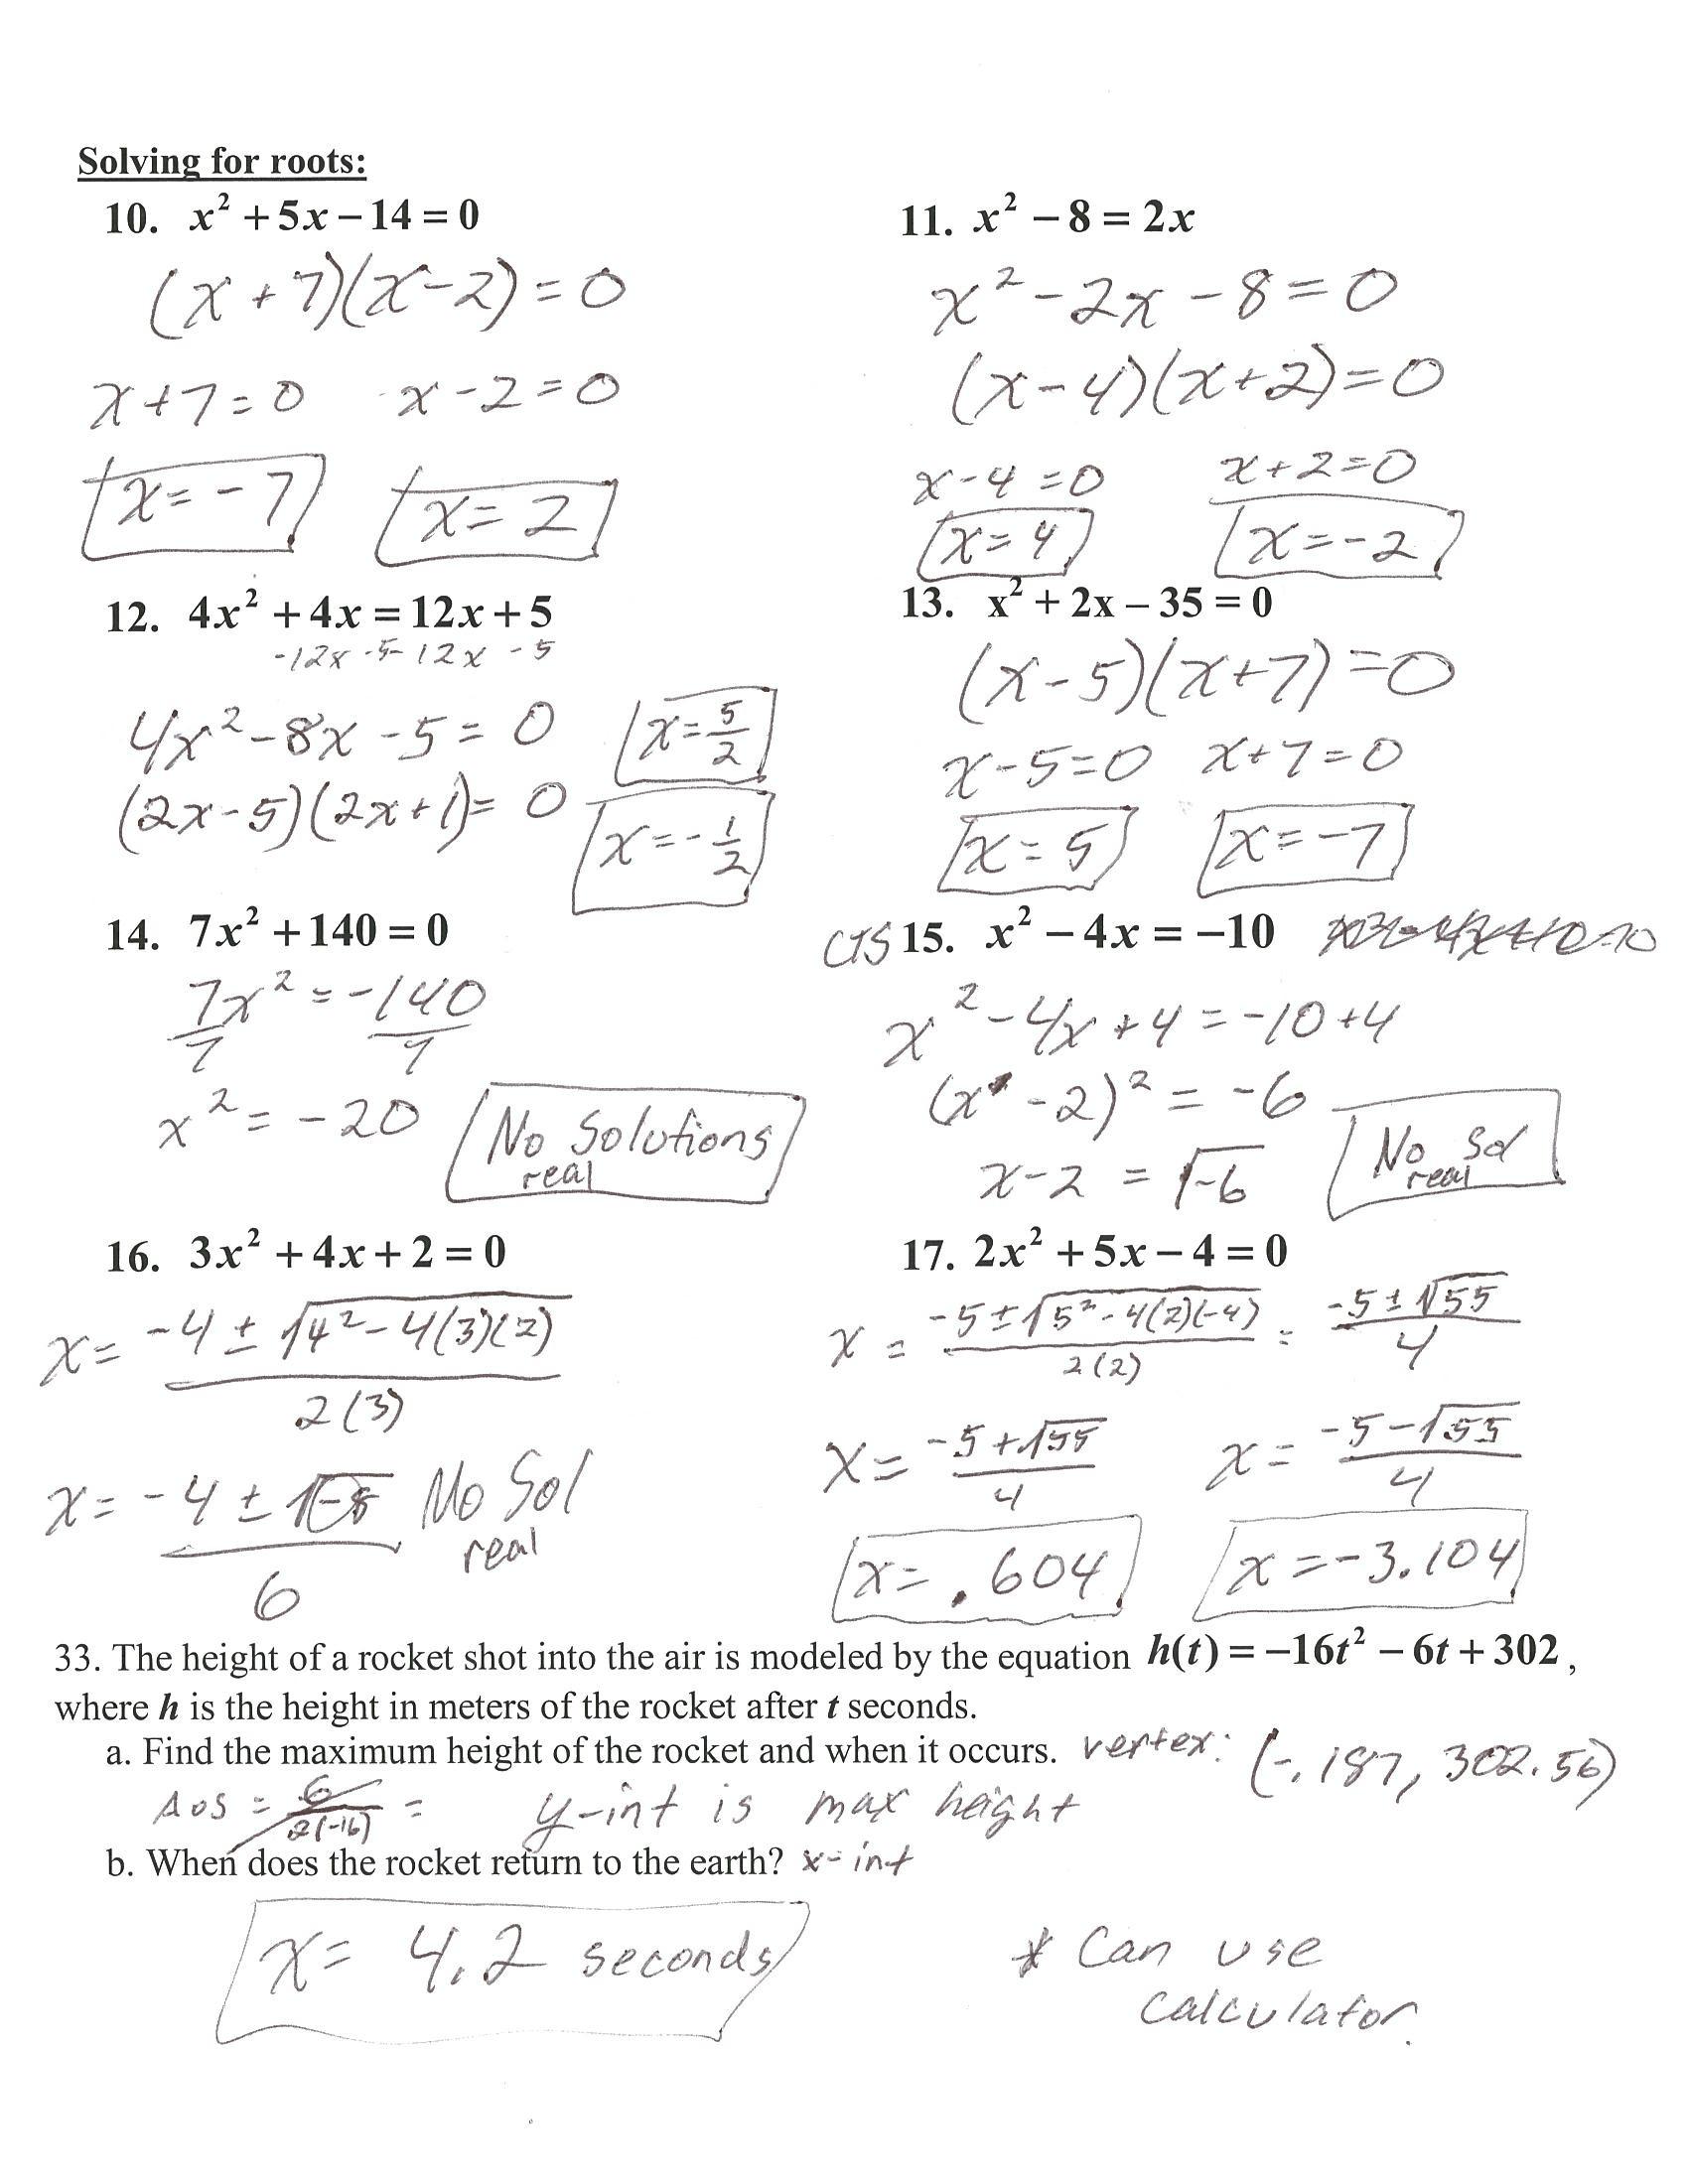 Algebra 1 Review Worksheet Algebra 1 Review solving Equations Answers Tessshebaylo